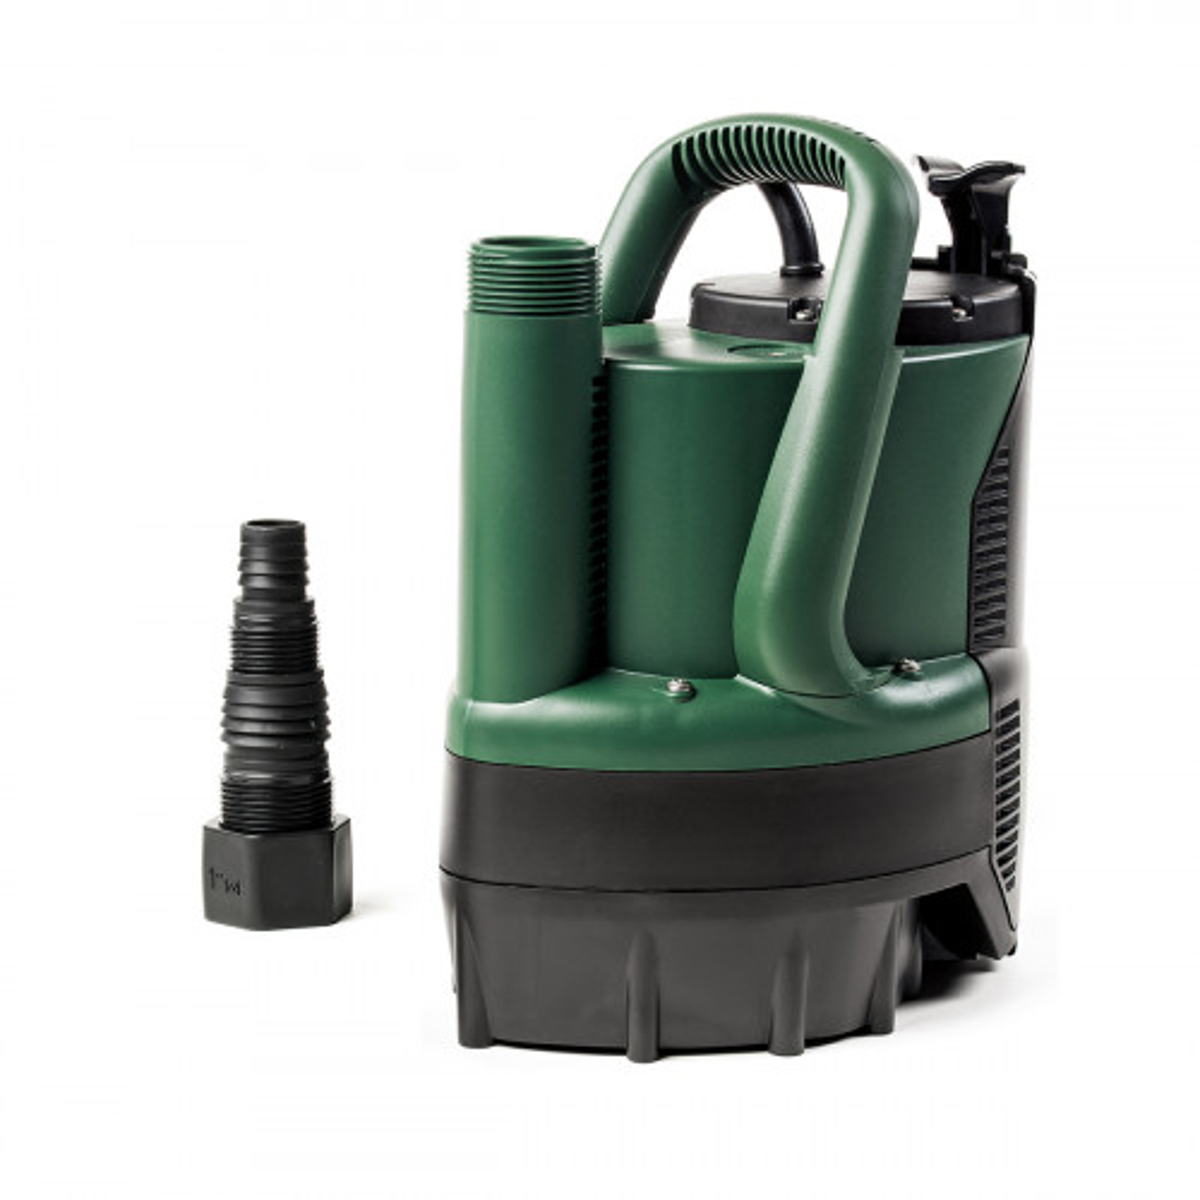 DAB VERTY NOVA 200 M-A Submersible Utility Pump